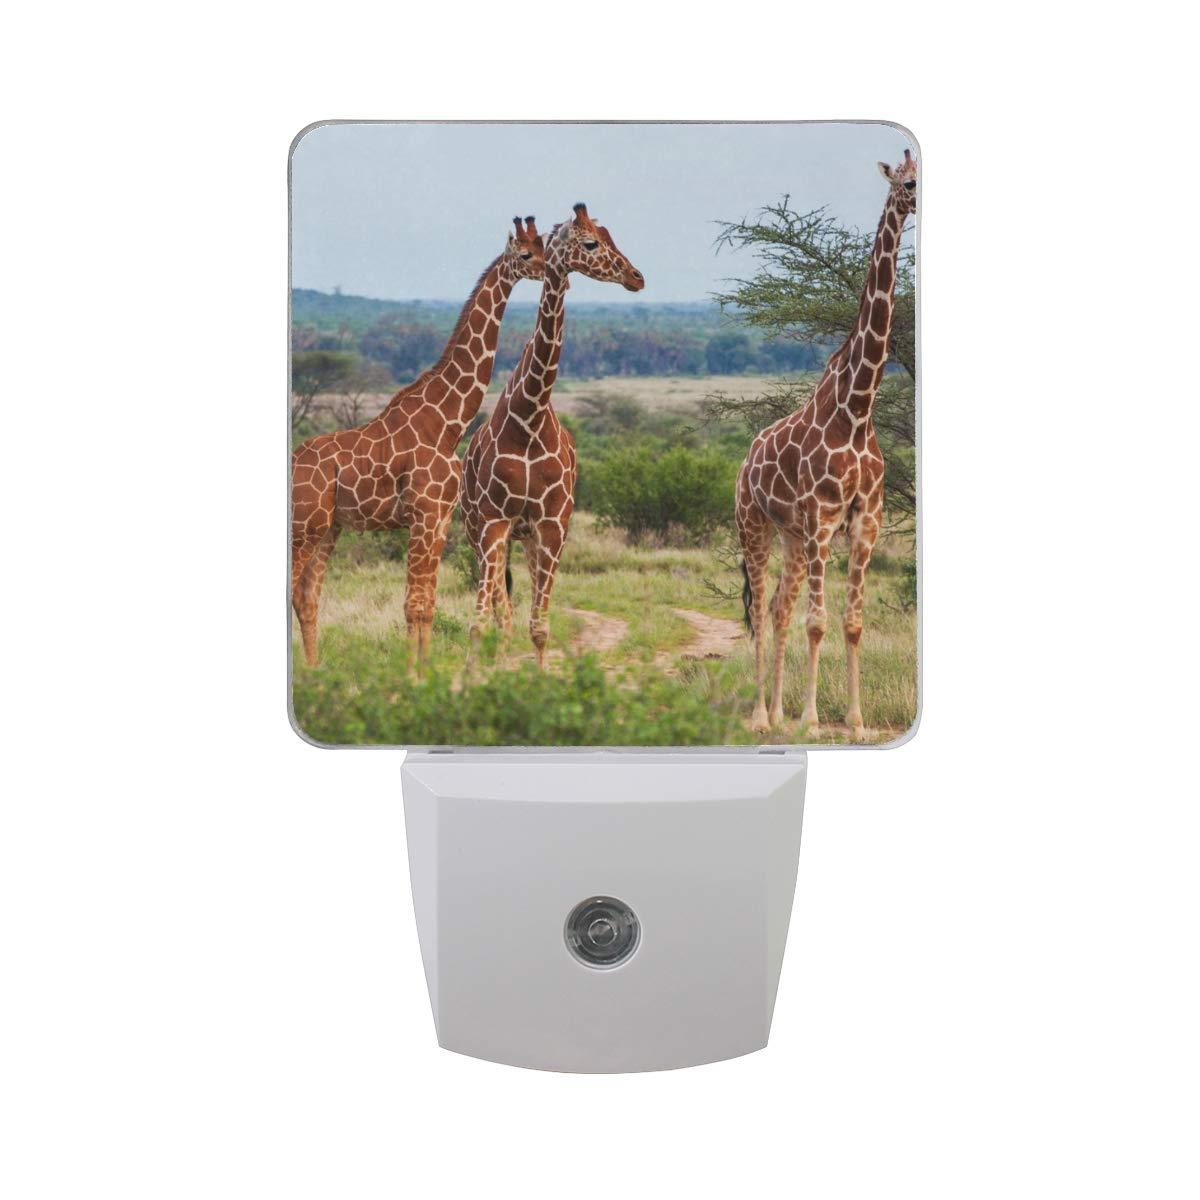 Night Light Giraffe On The Prairie Led Light Lamp for Hallway, Kitchen, Bathroom, Bedroom, Stairs, DaylightWhite, Bedroom, Compact